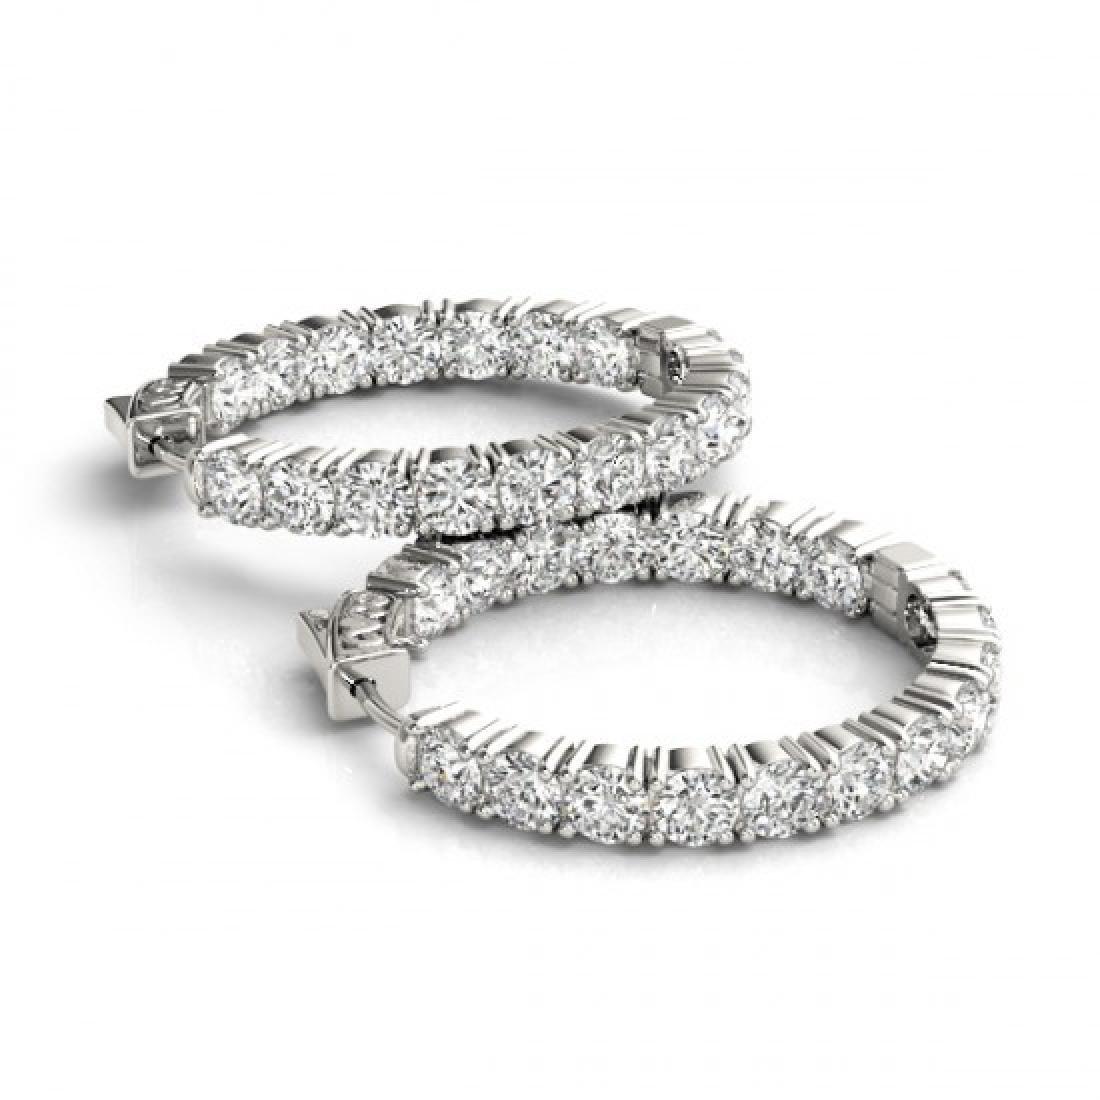 3.5 CTW Diamond VS/SI Certified 22 Mm Hoop Earrings 14K